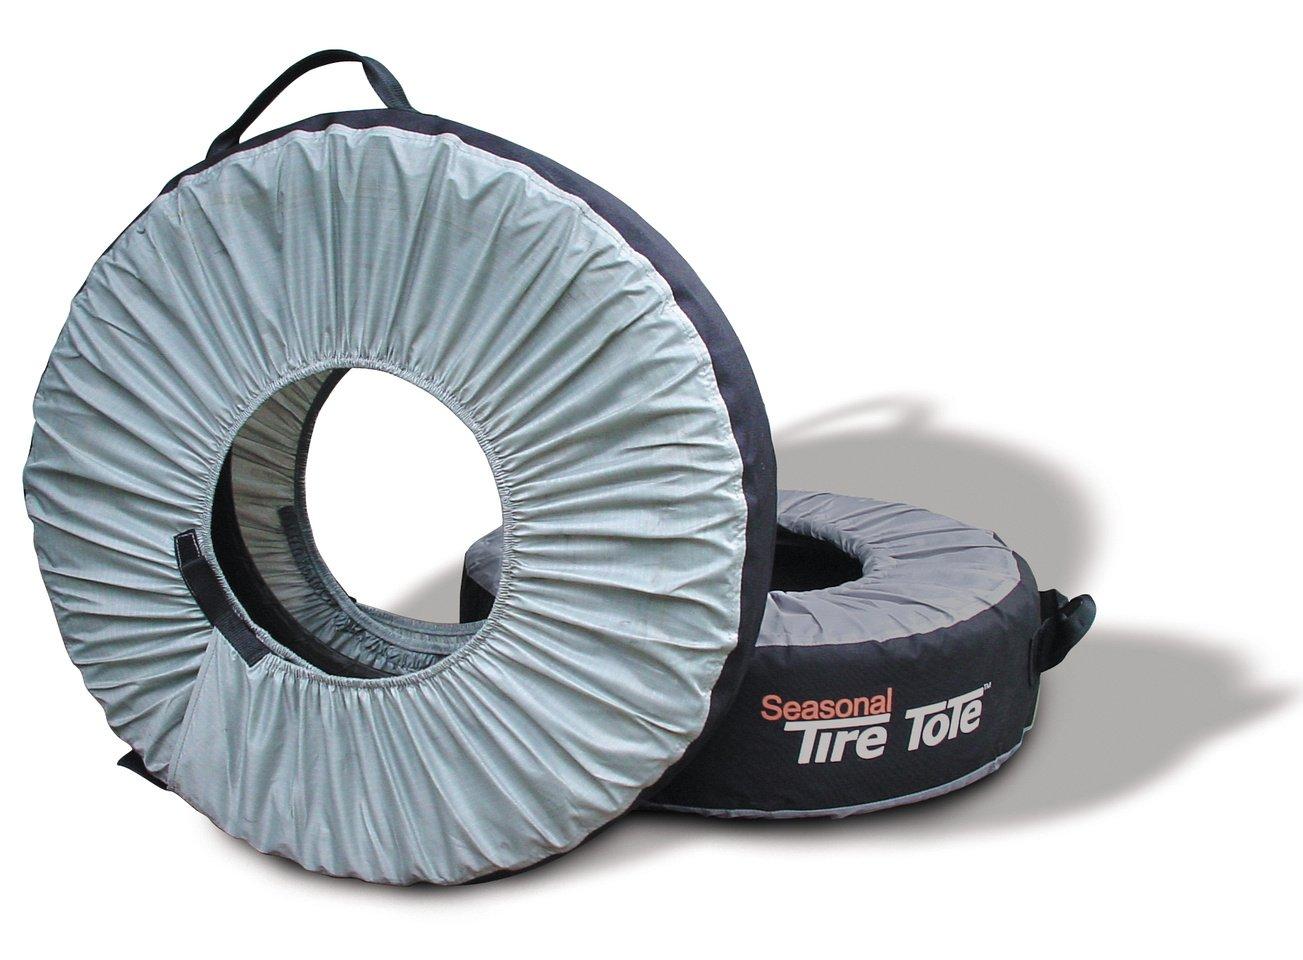 Kurgo Seasonal Tire Tote(TM), (Pack of 4) 00036